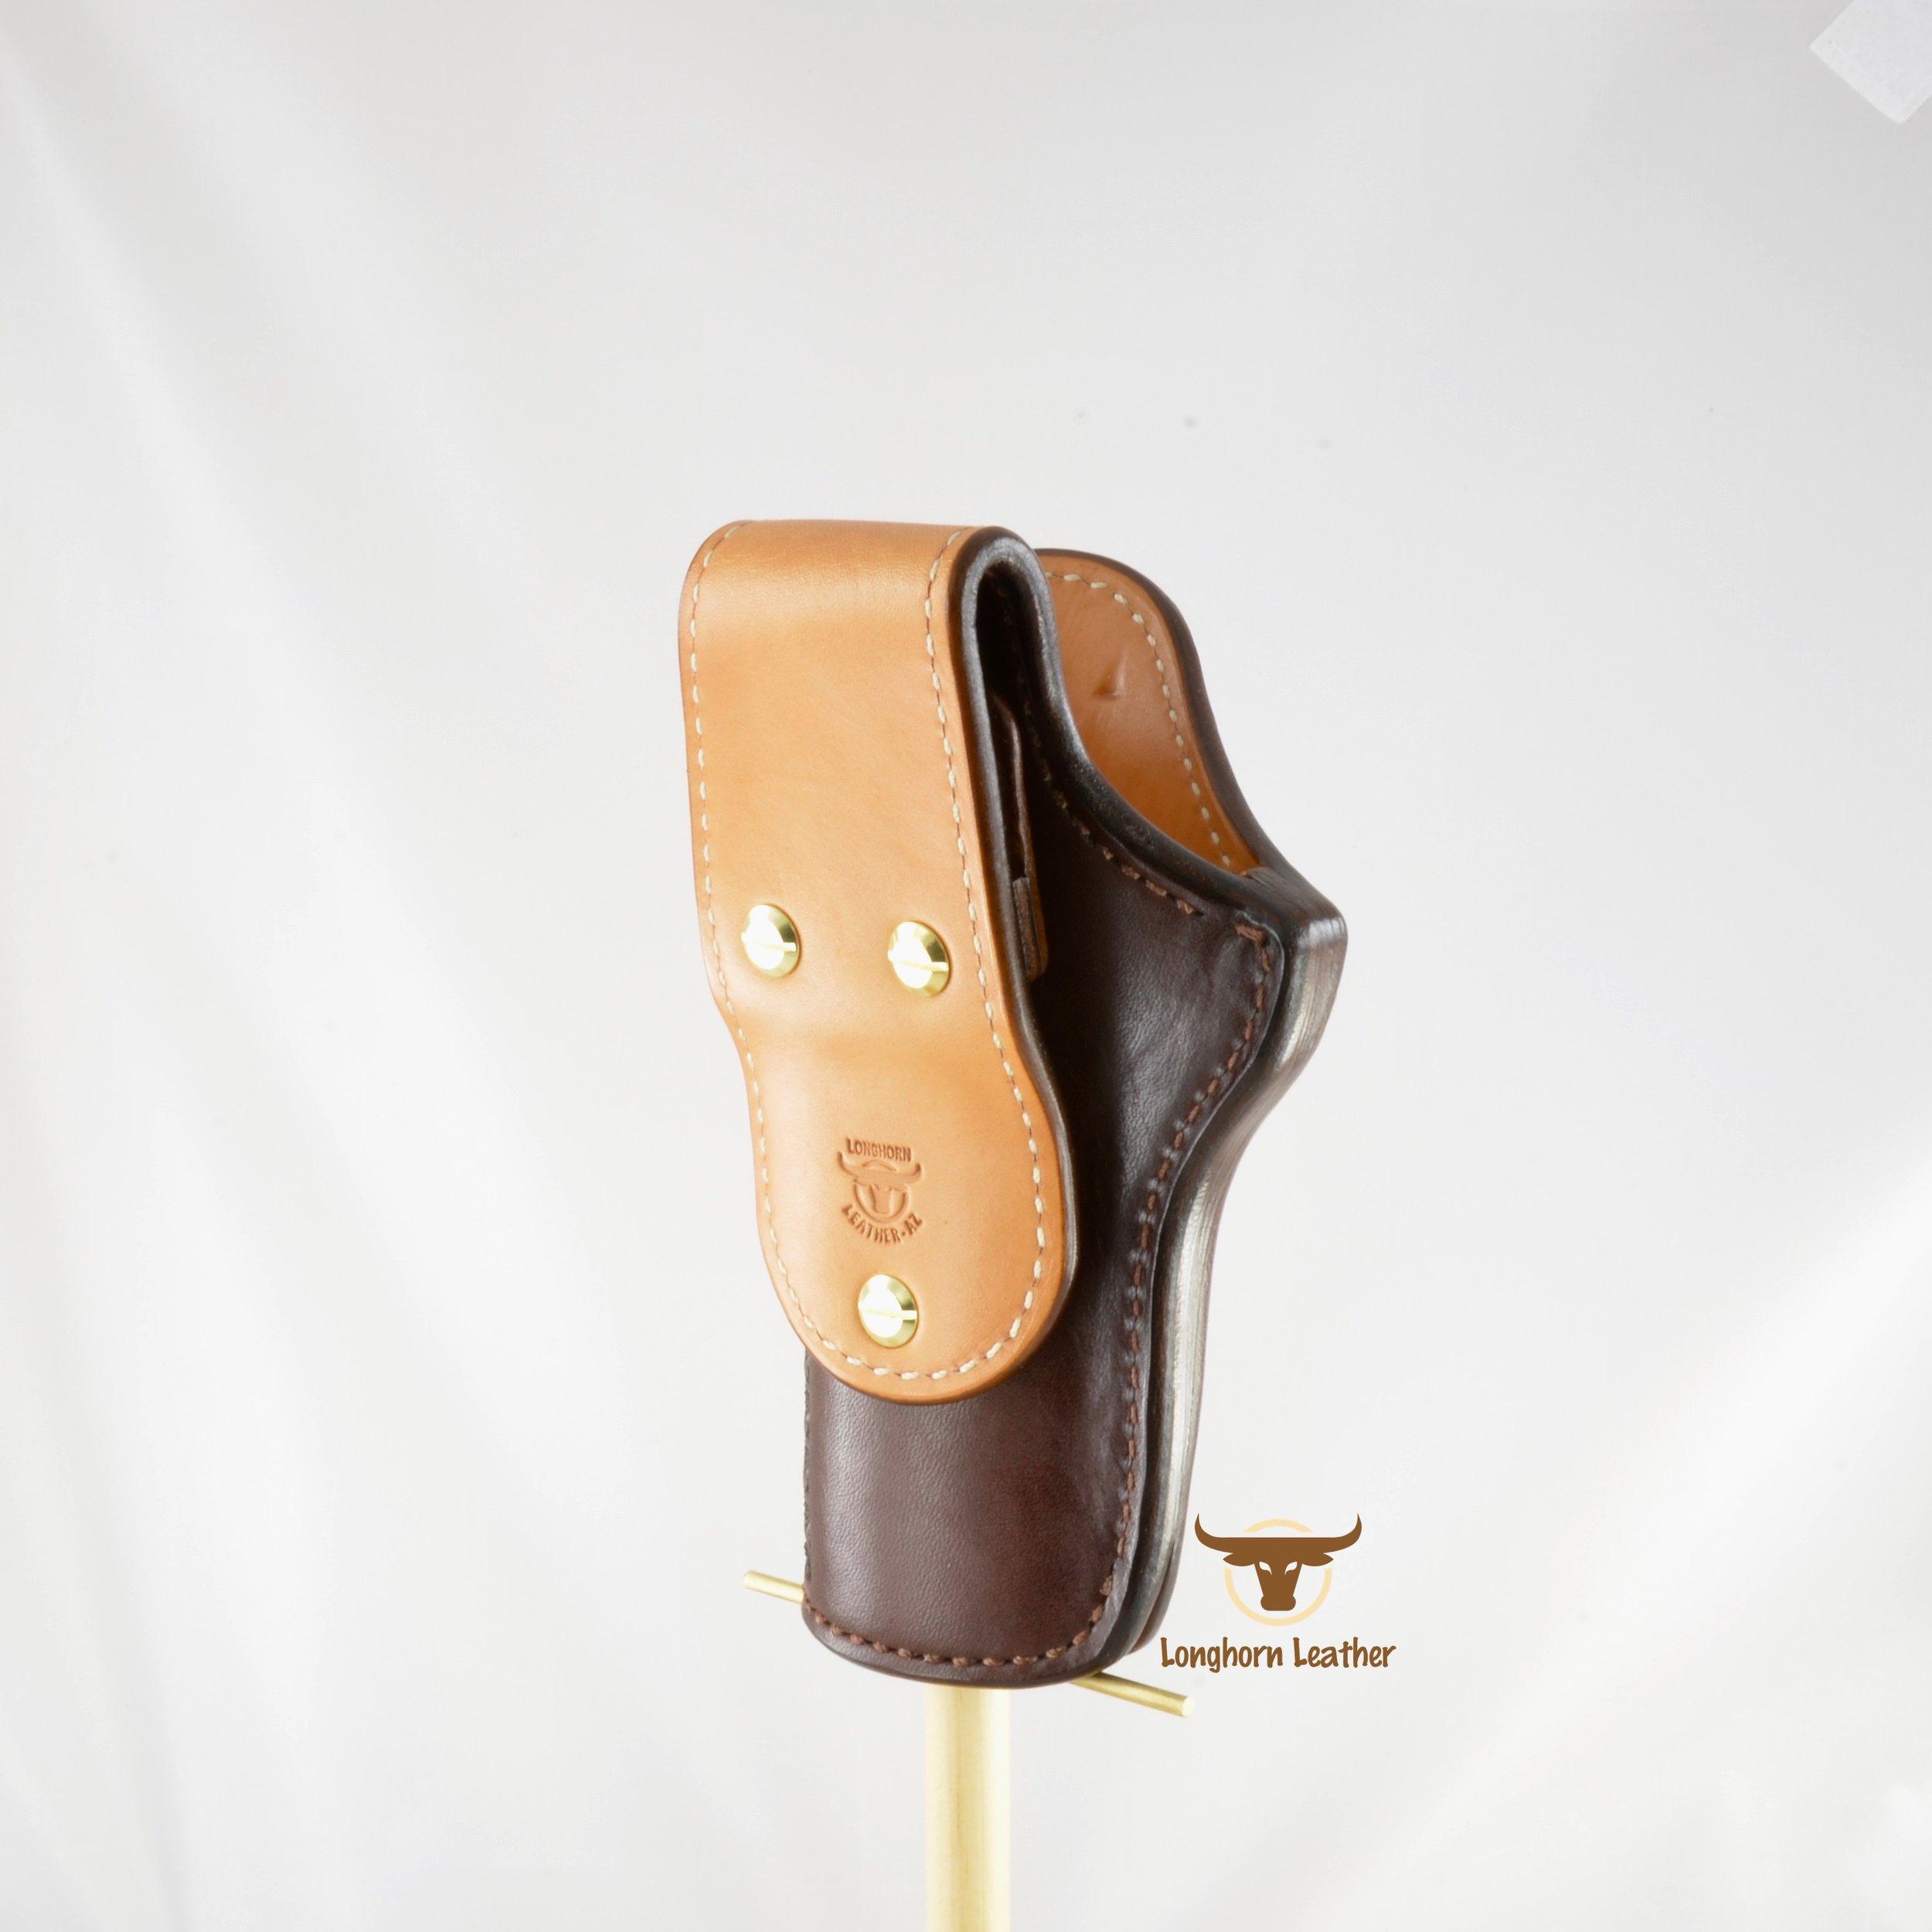 Longhorn Leather AZ - 1911 Holster featurng the %22San Carlos%22 design 8.jpg